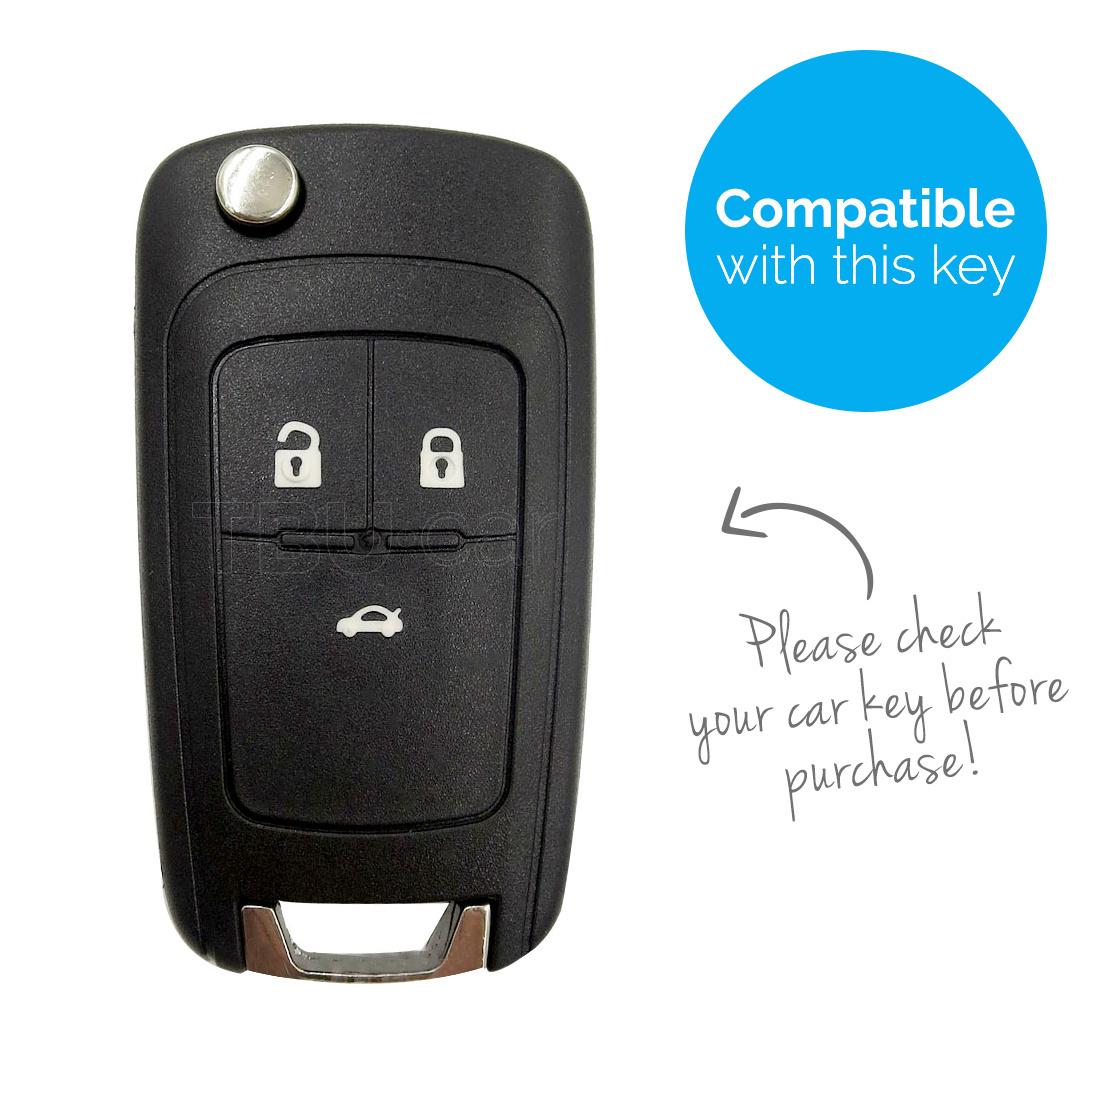 TBU car TBU car Autoschlüssel Hülle kompatibel mit Opel 3 Tasten - Schutzhülle aus Silikon - Auto Schlüsselhülle Cover in Hellblau